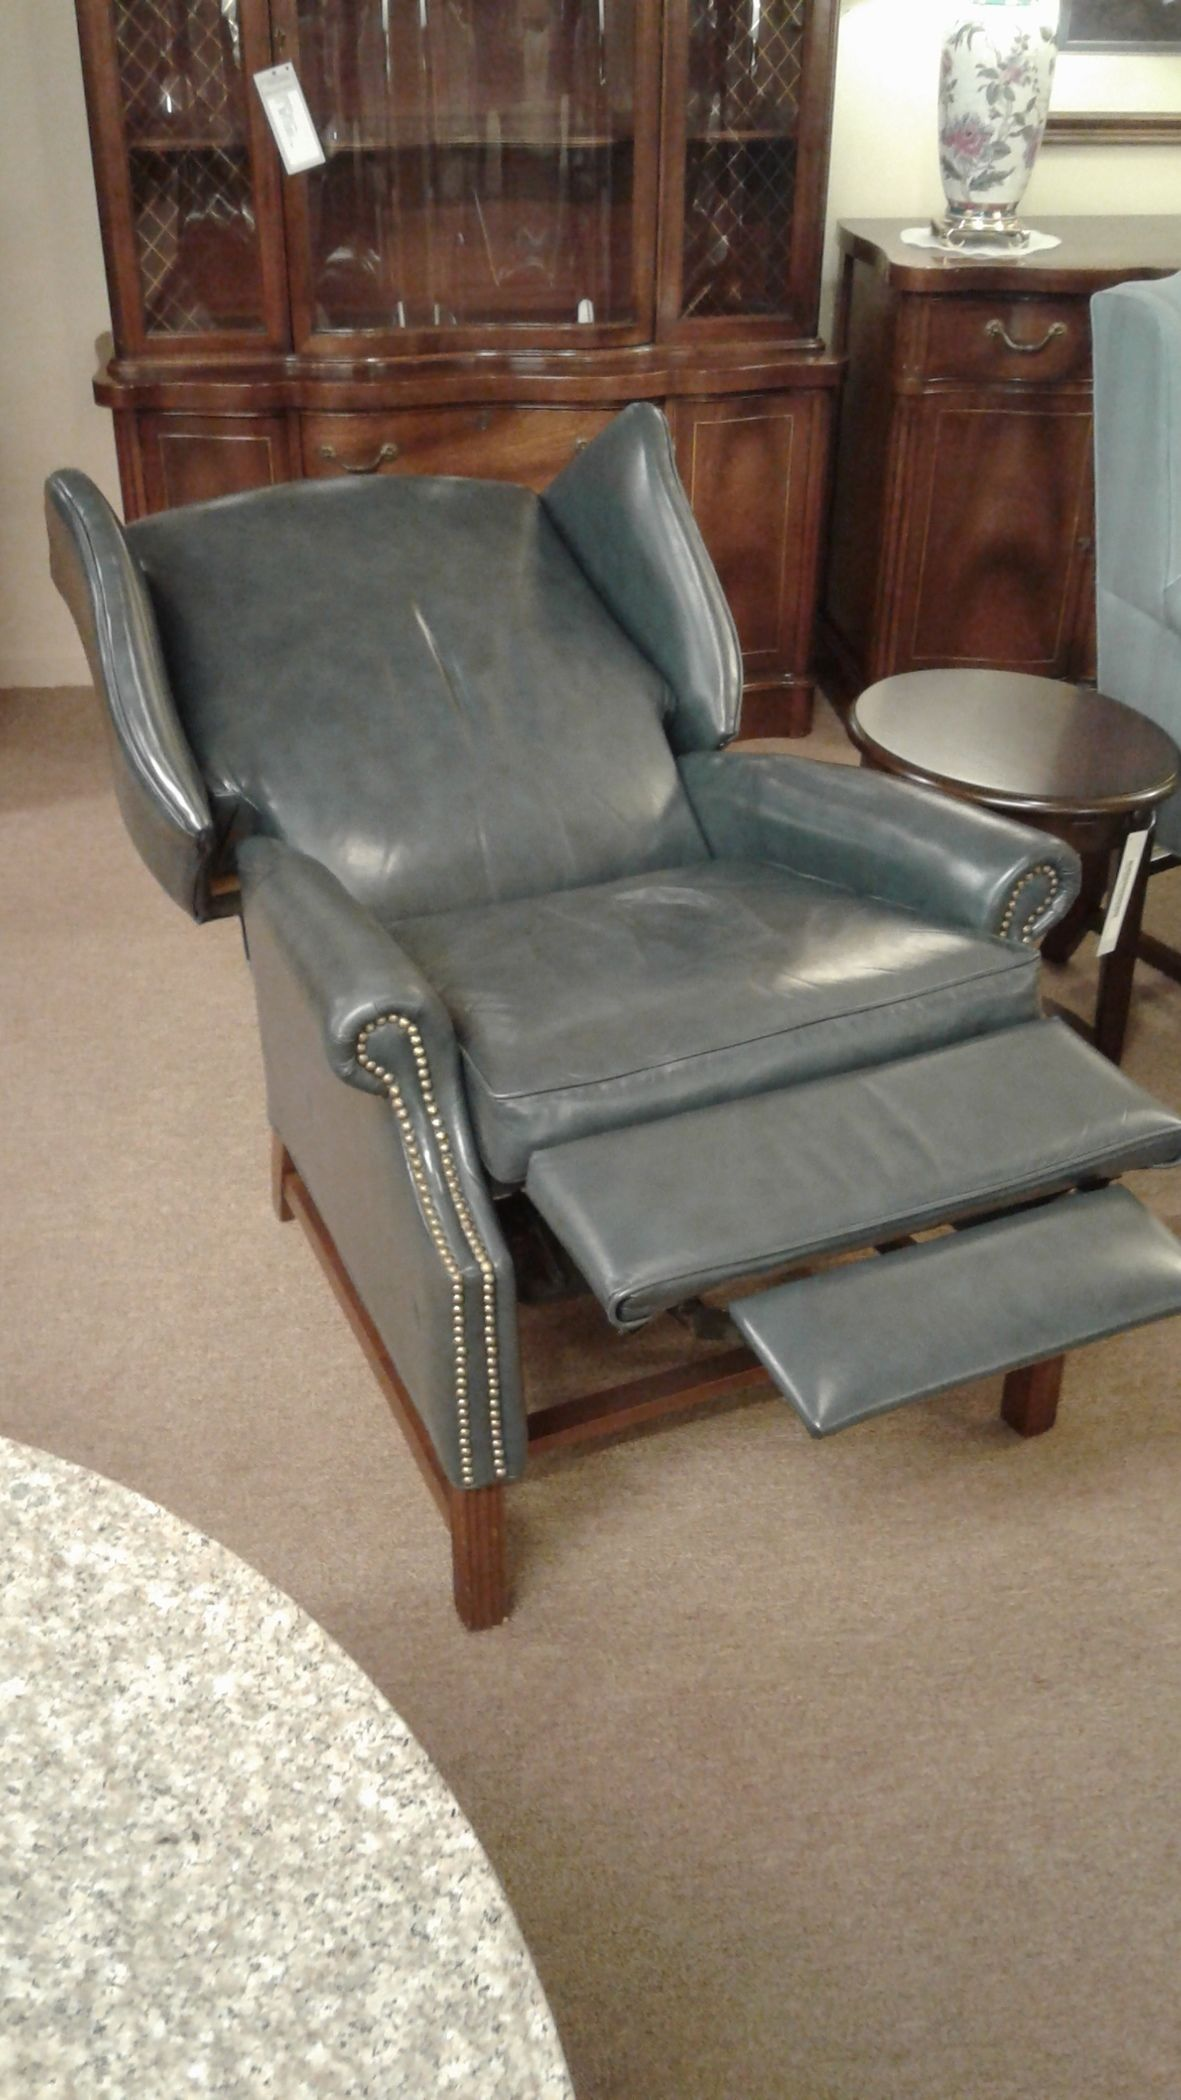 Leather Wingback Recliner Delmarva Furniture Consignment